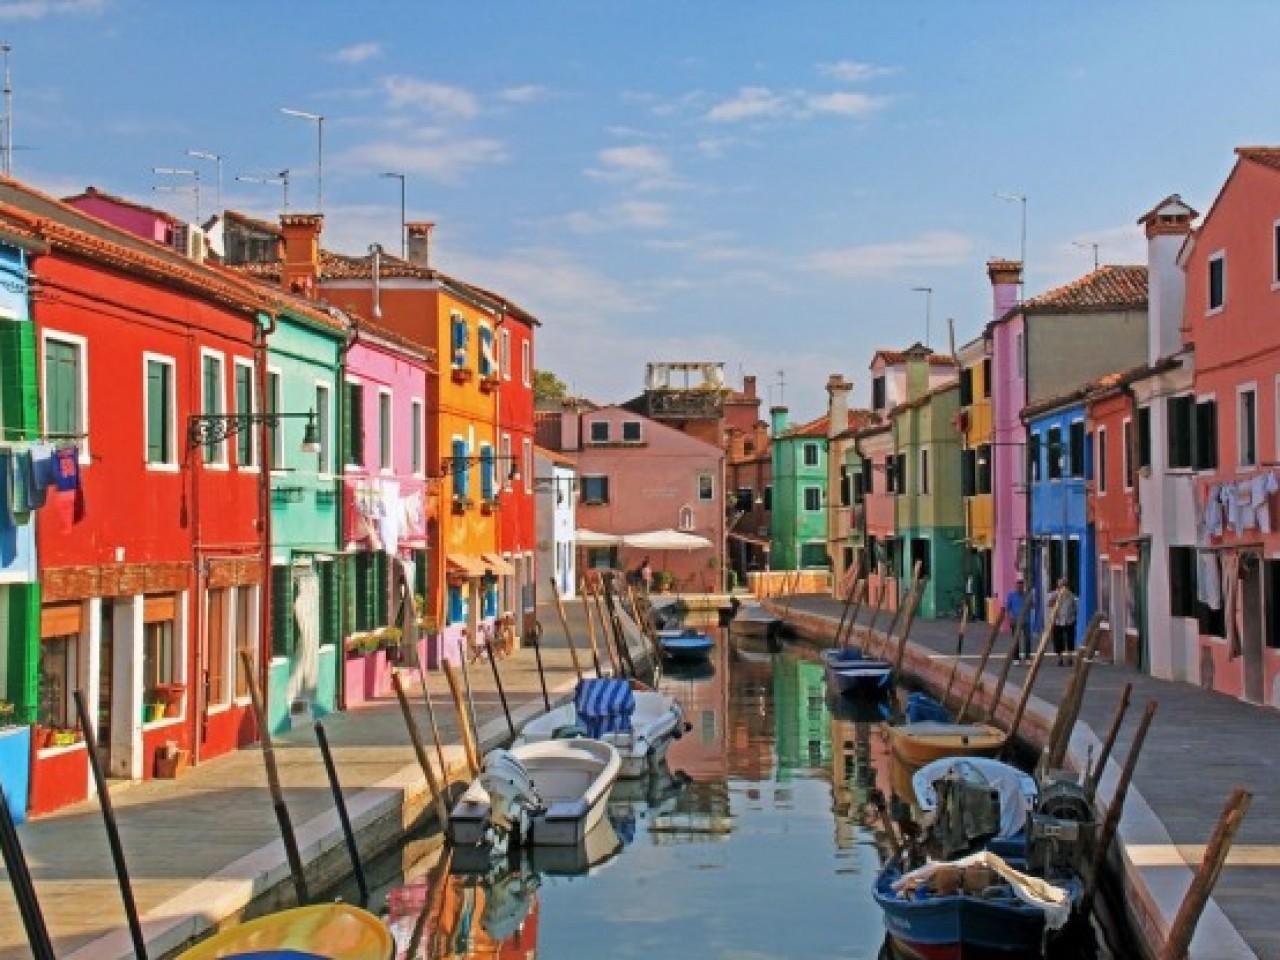 Murano, Burano and Torcello